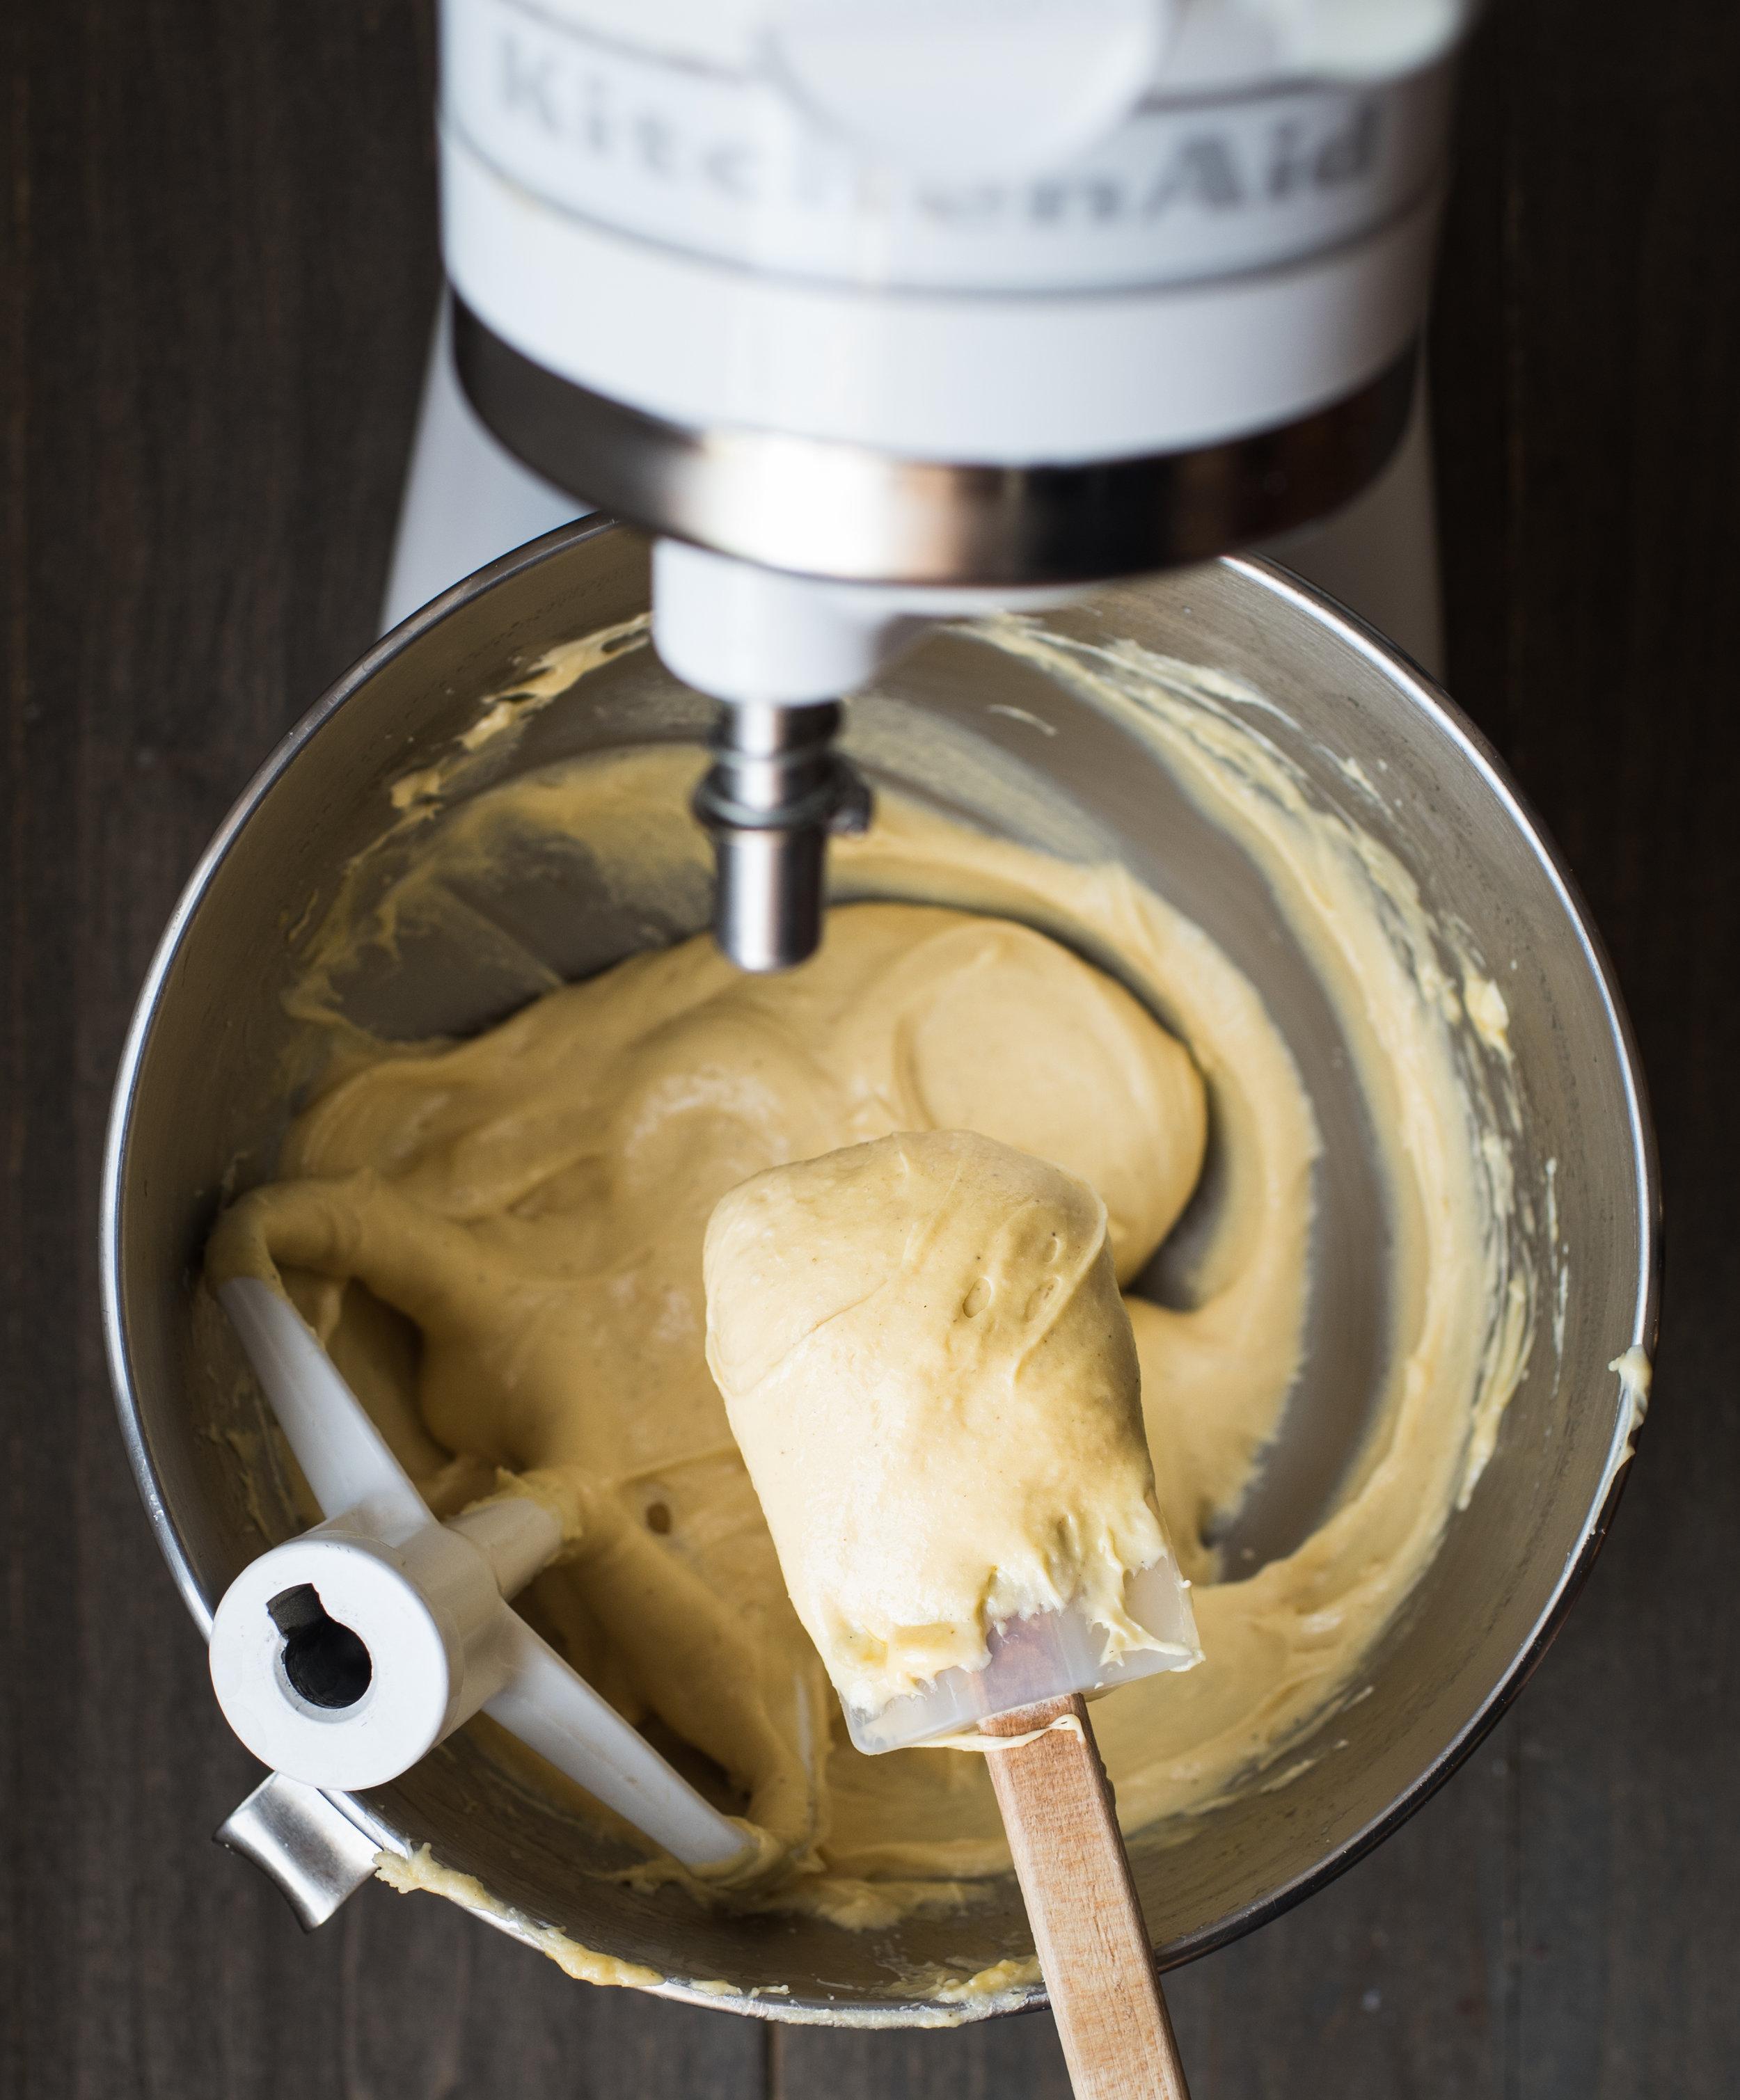 gf choux pastry-7086.jpg